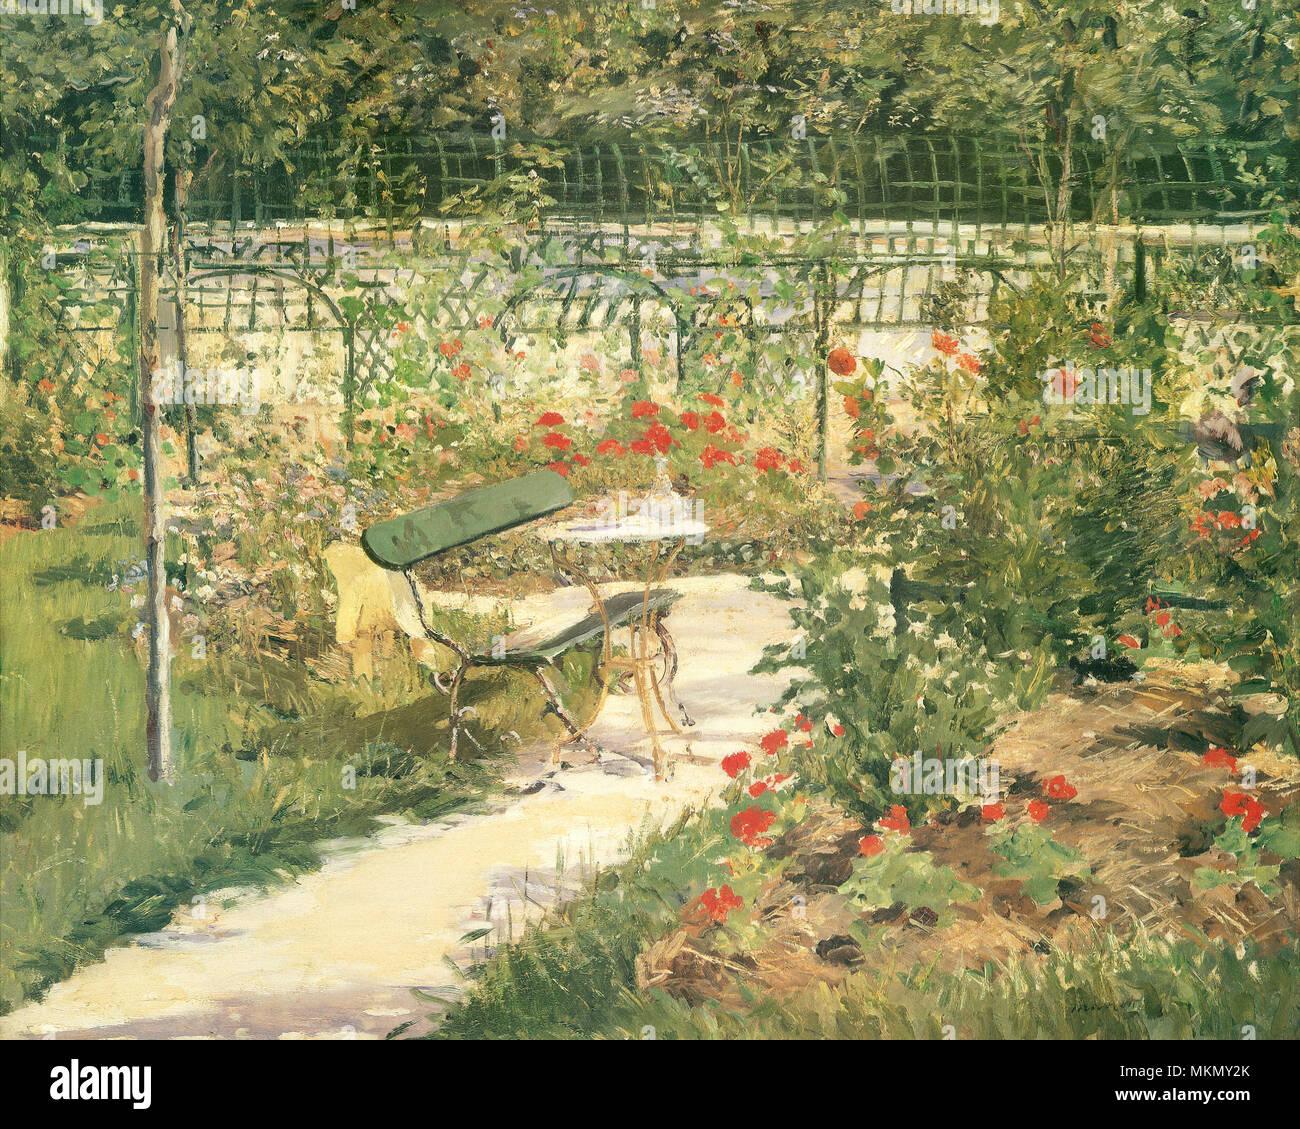 The Artists' Garden, Versailles Stock Photo: 184242427 - Alamy